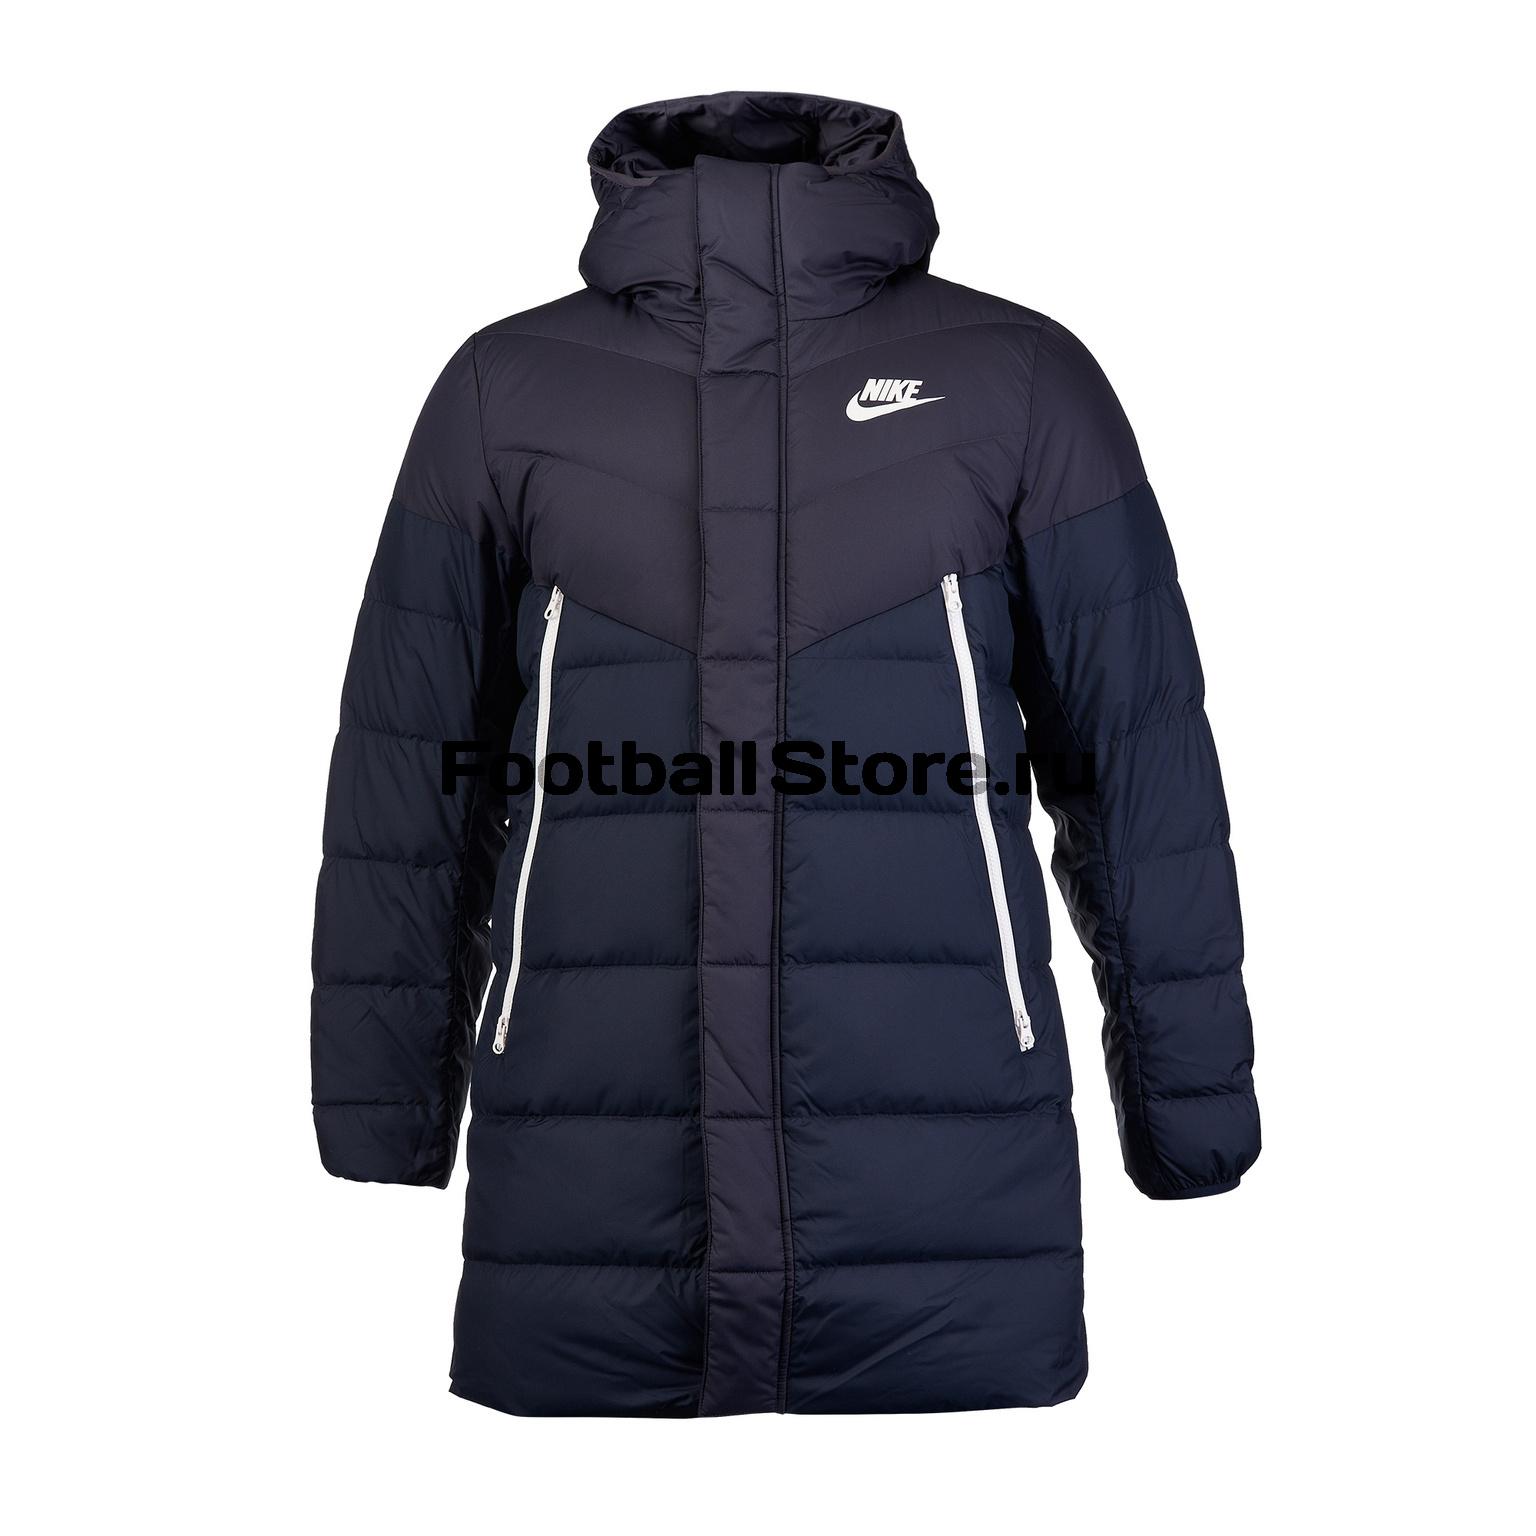 Пуховик Nike Dwn Fill Wr Parka AO8915-081